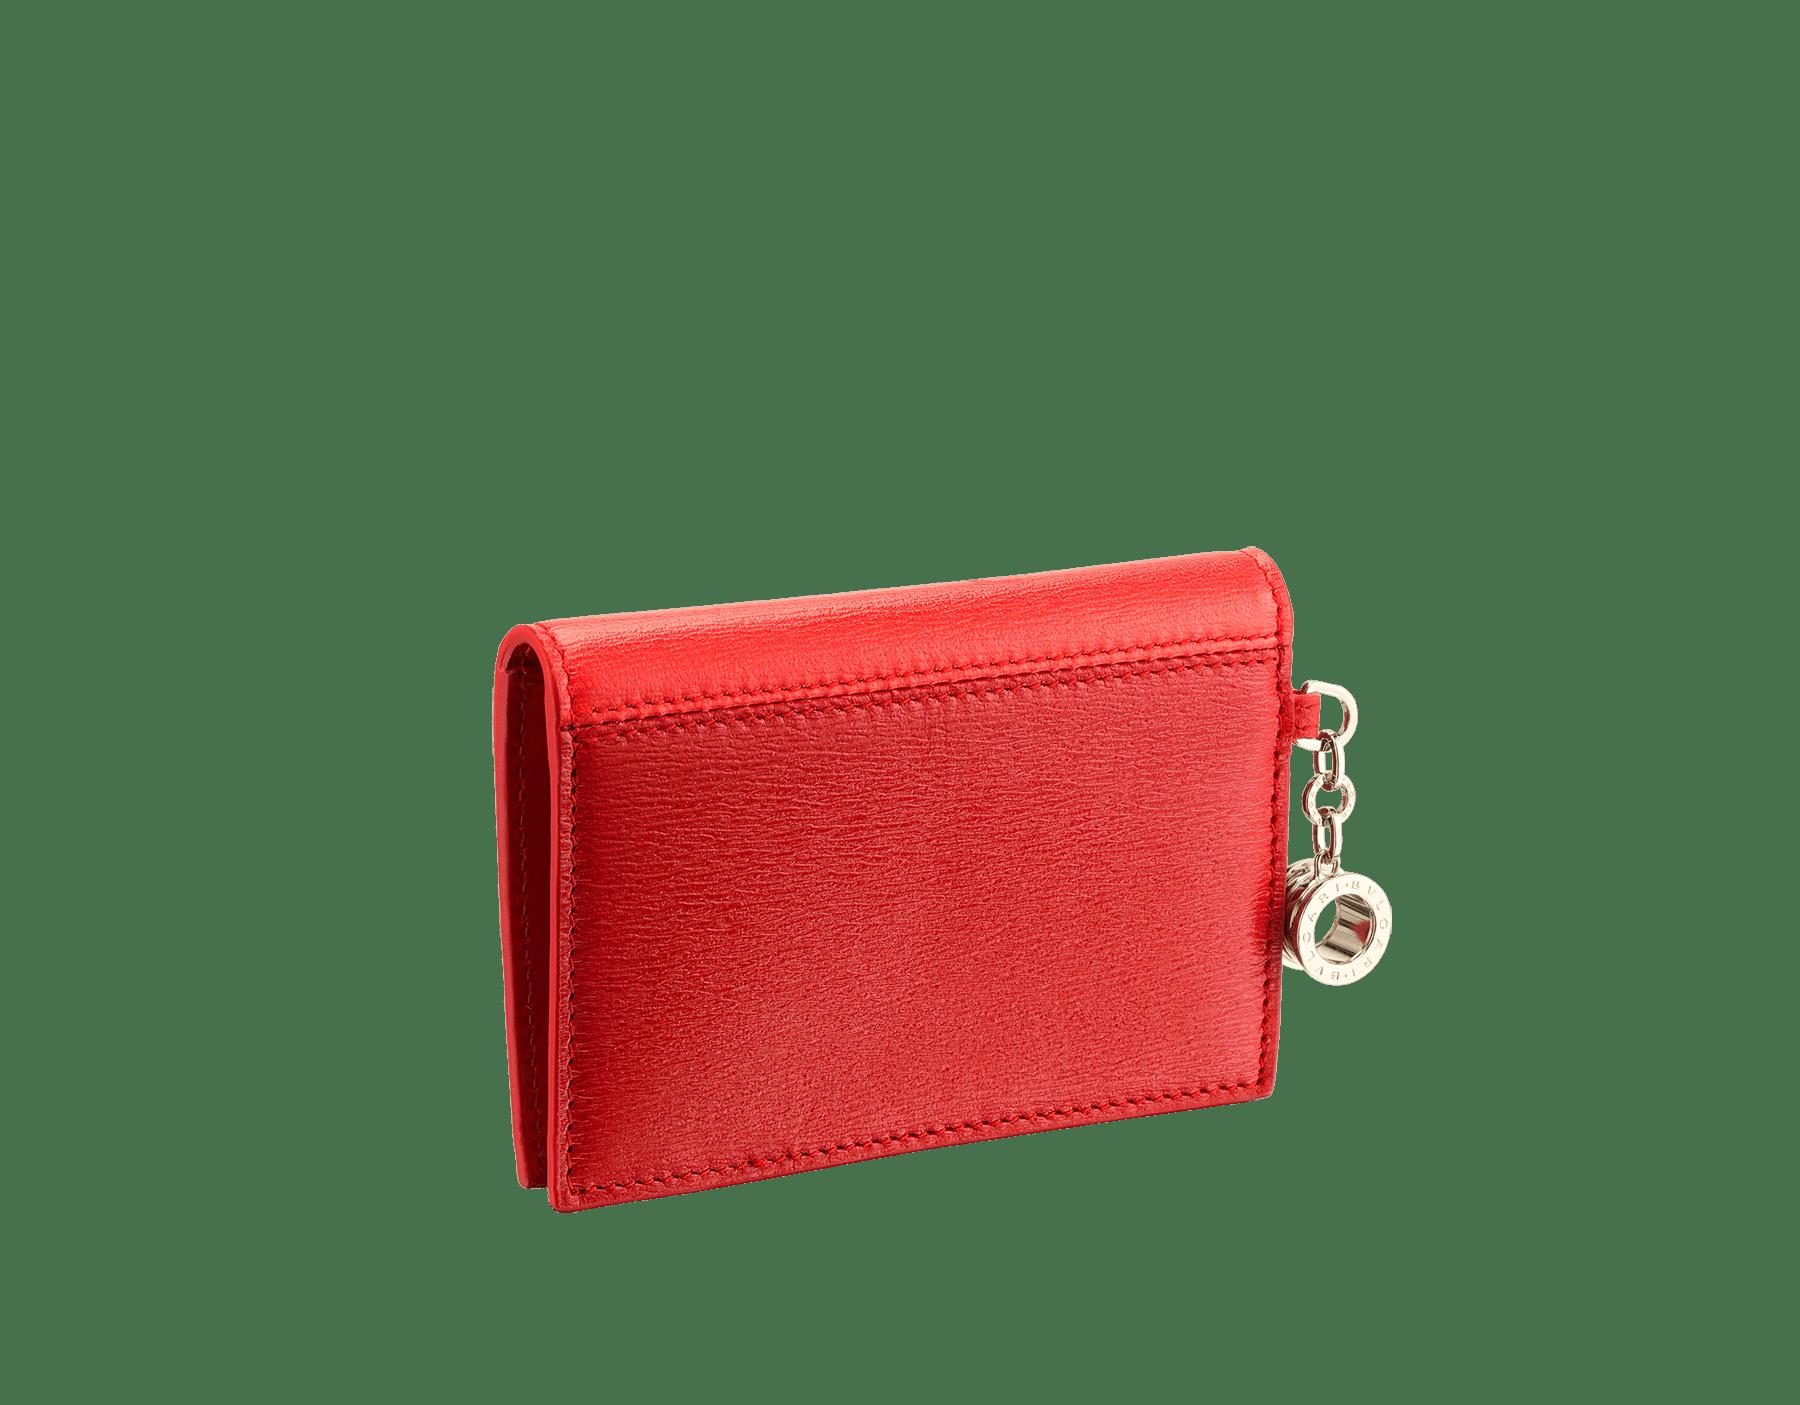 B.zero1 open credit card holder in sea star coral and carmine jasper goatskin. Iconic B.zero1 charm in light gold-plated brass. 288237 image 3